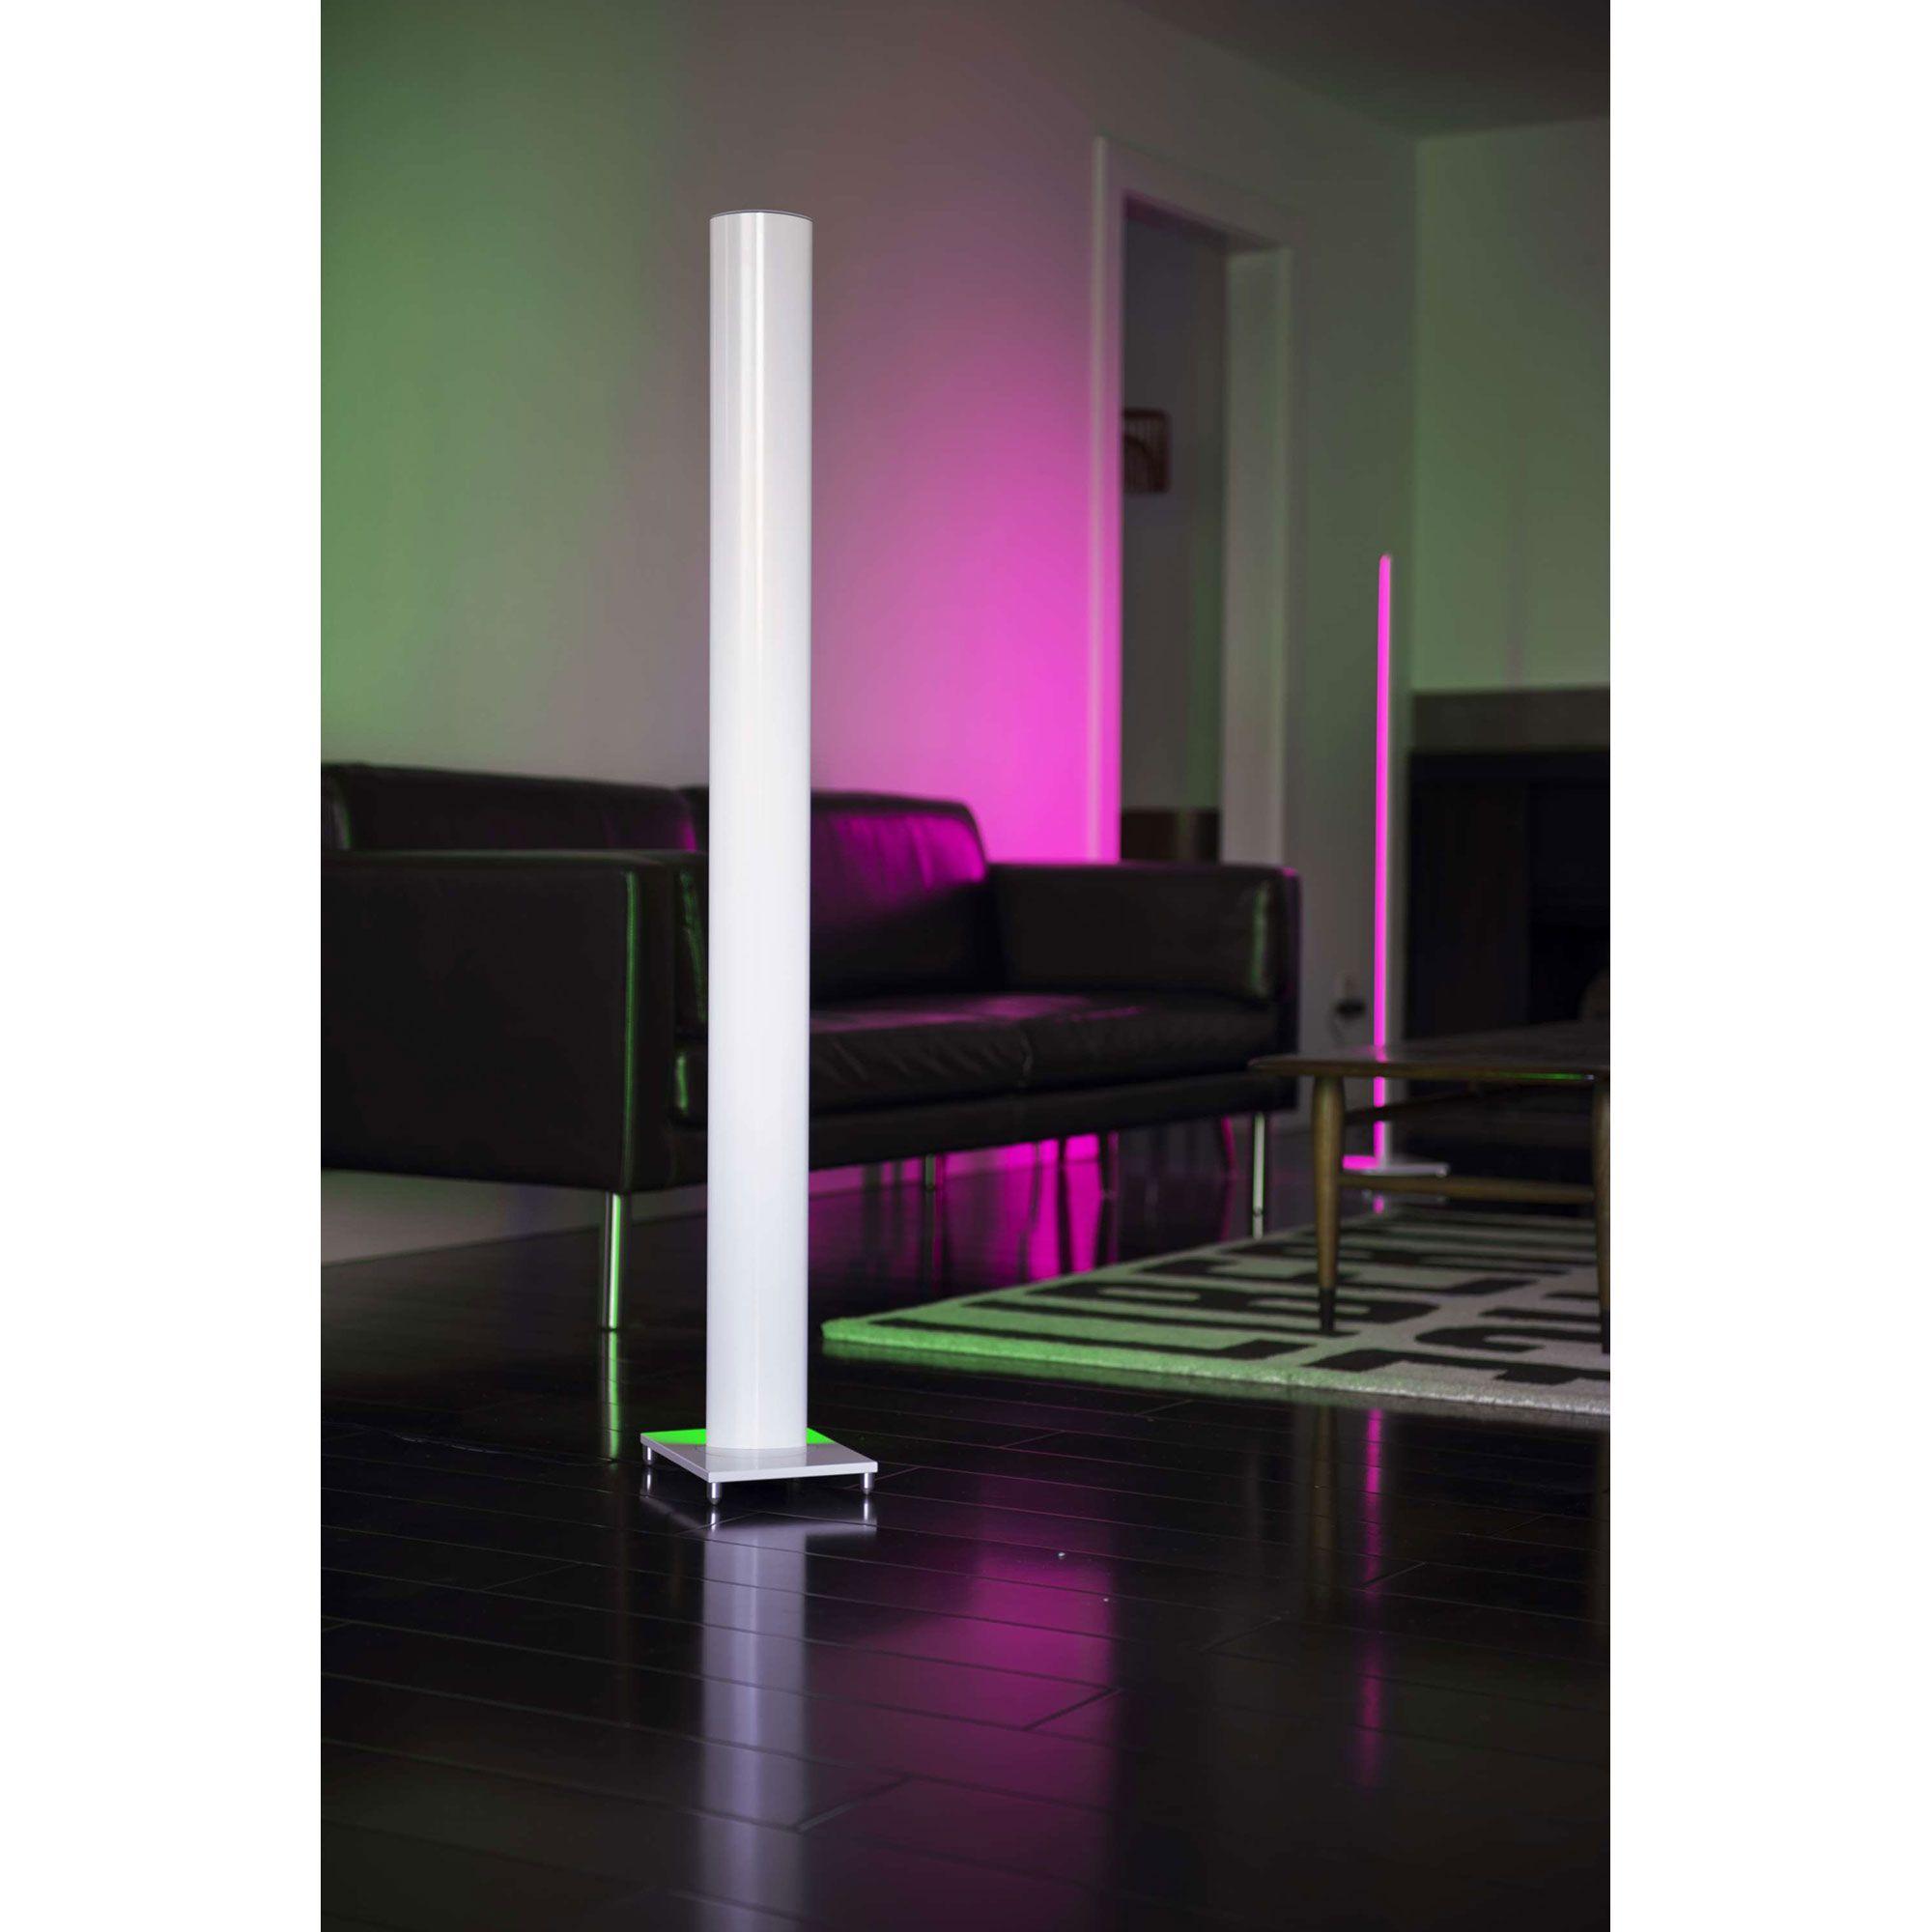 Tono Floor Mood Light By Koncept Lighting Mc1 Wht Flr In 2020 Led Floor Lamp Mood Light Led Color